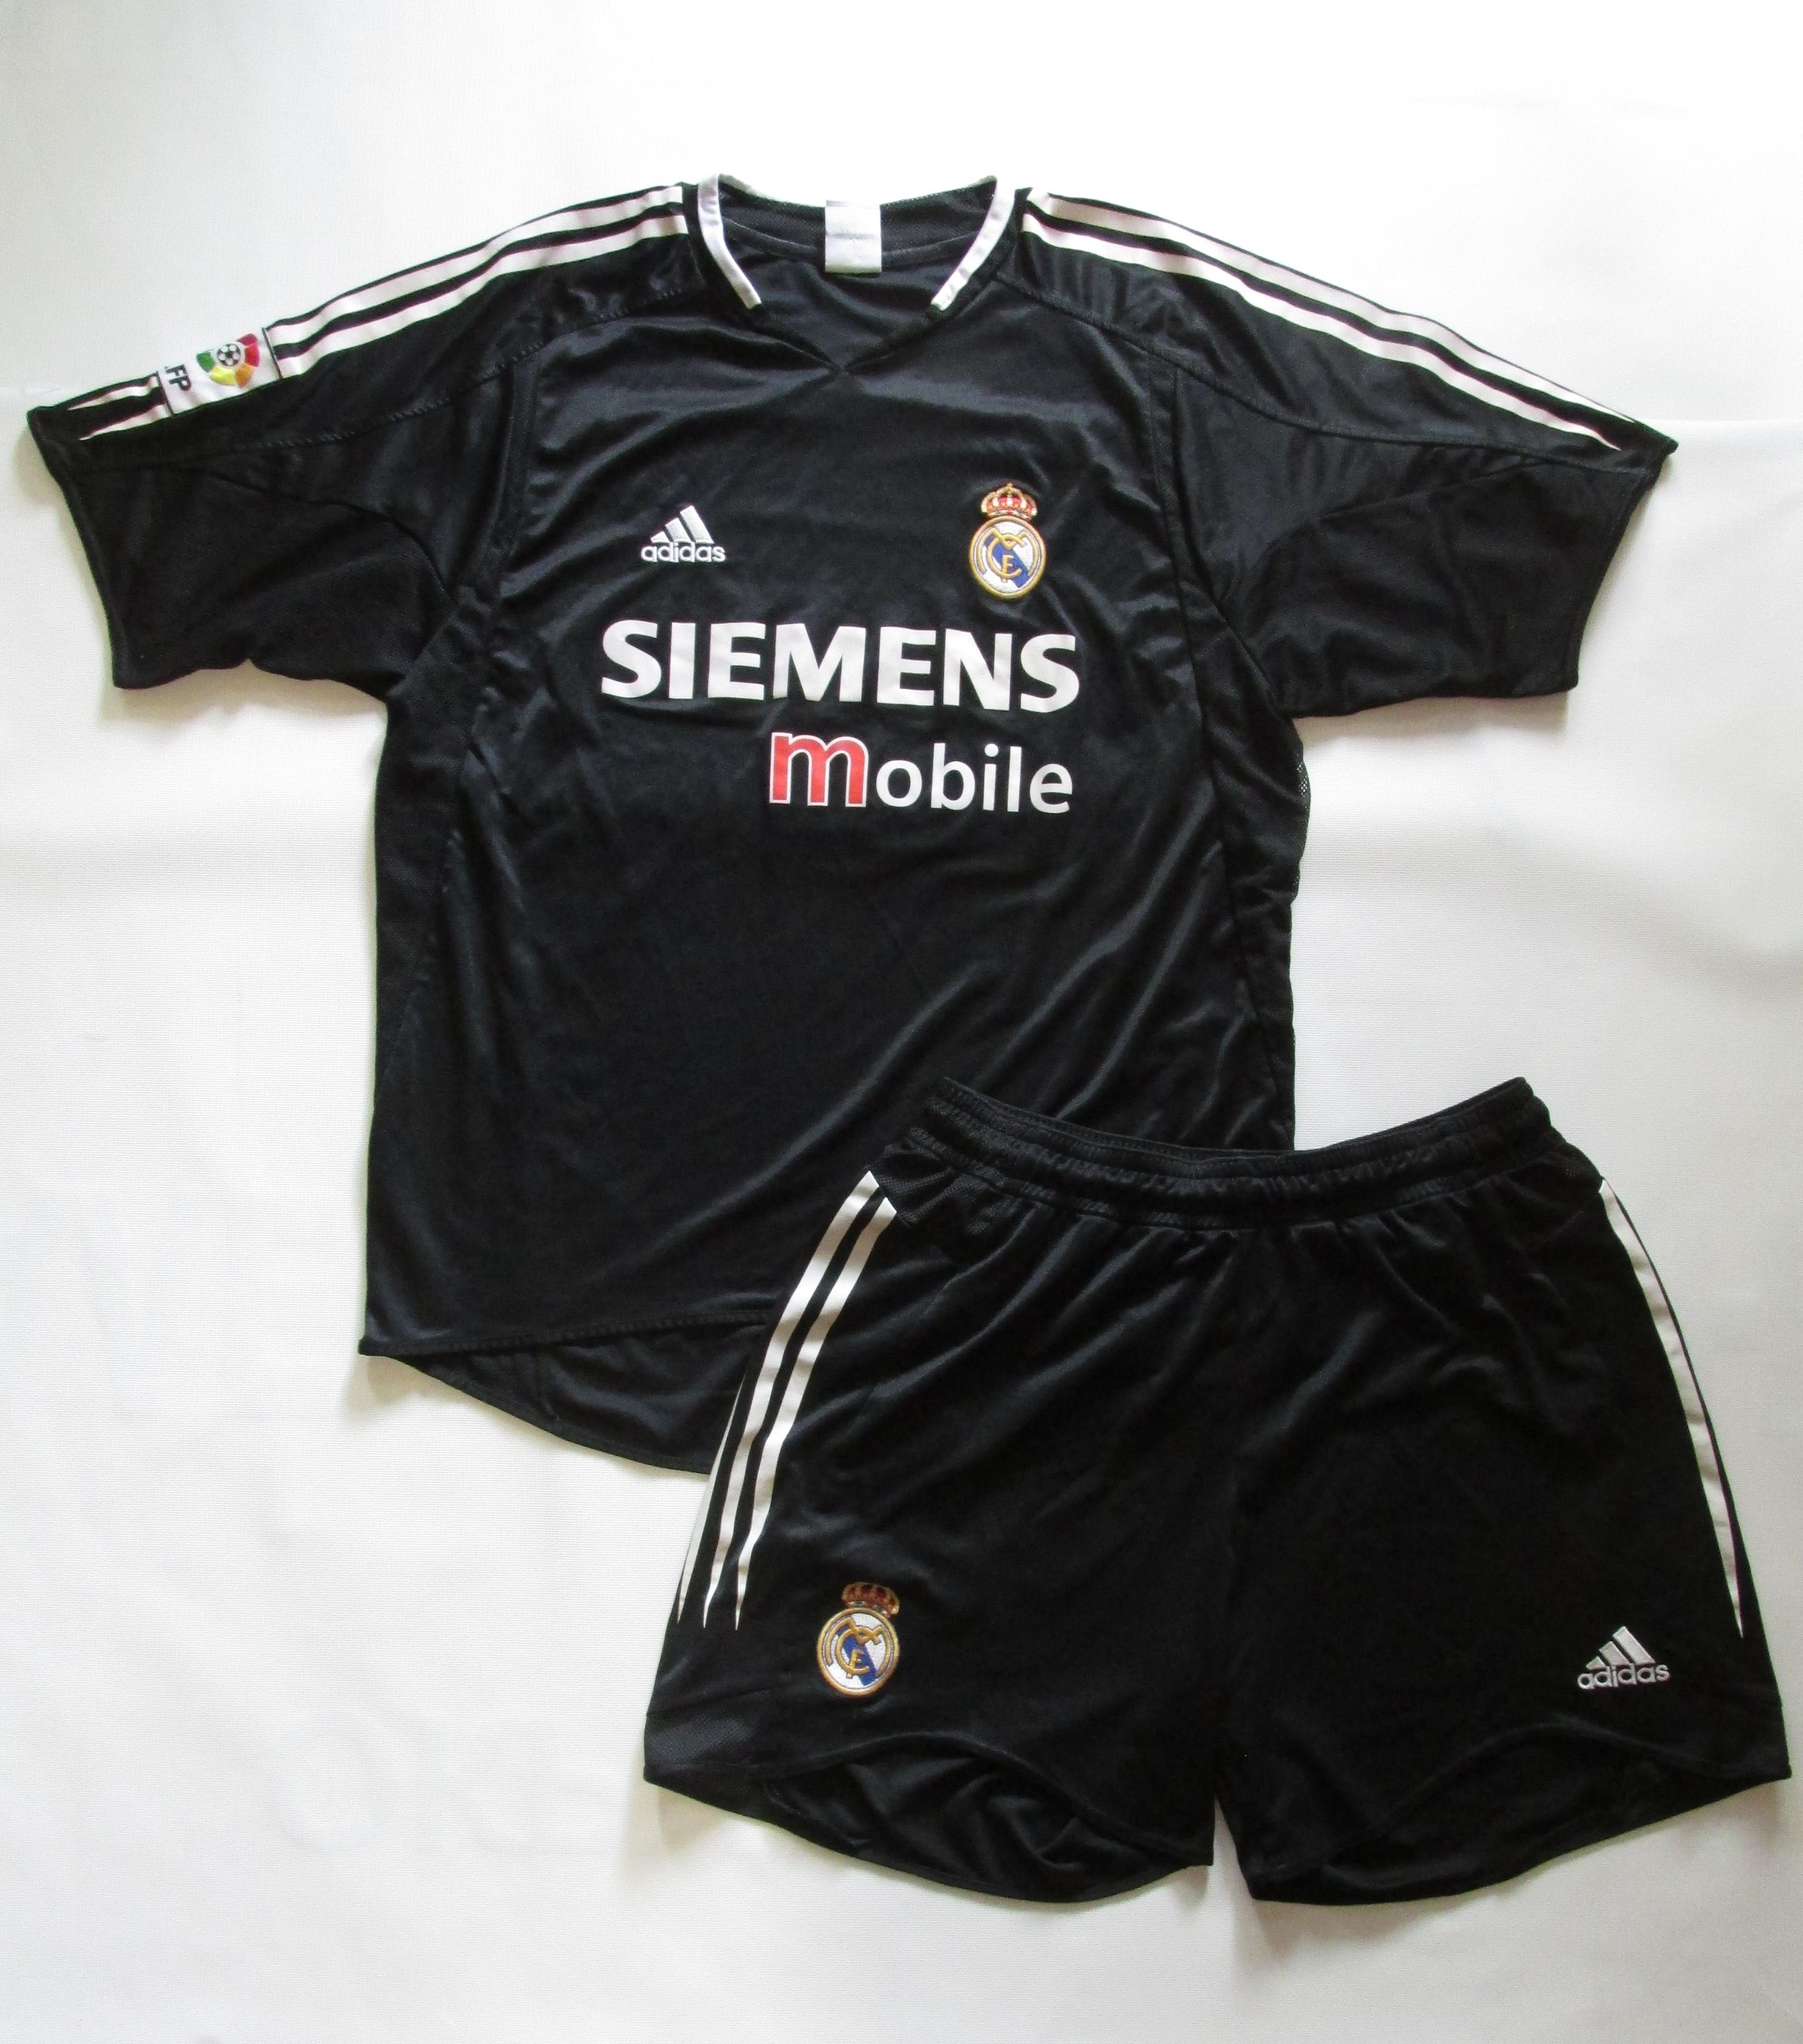 Real Madrid 2004 2005 Away Football Shirt Shorts By Adidas Rmfc Madridista Vintage Footballkit Spain Laliga L Vintage Football Shirts Shirts Football Shirts